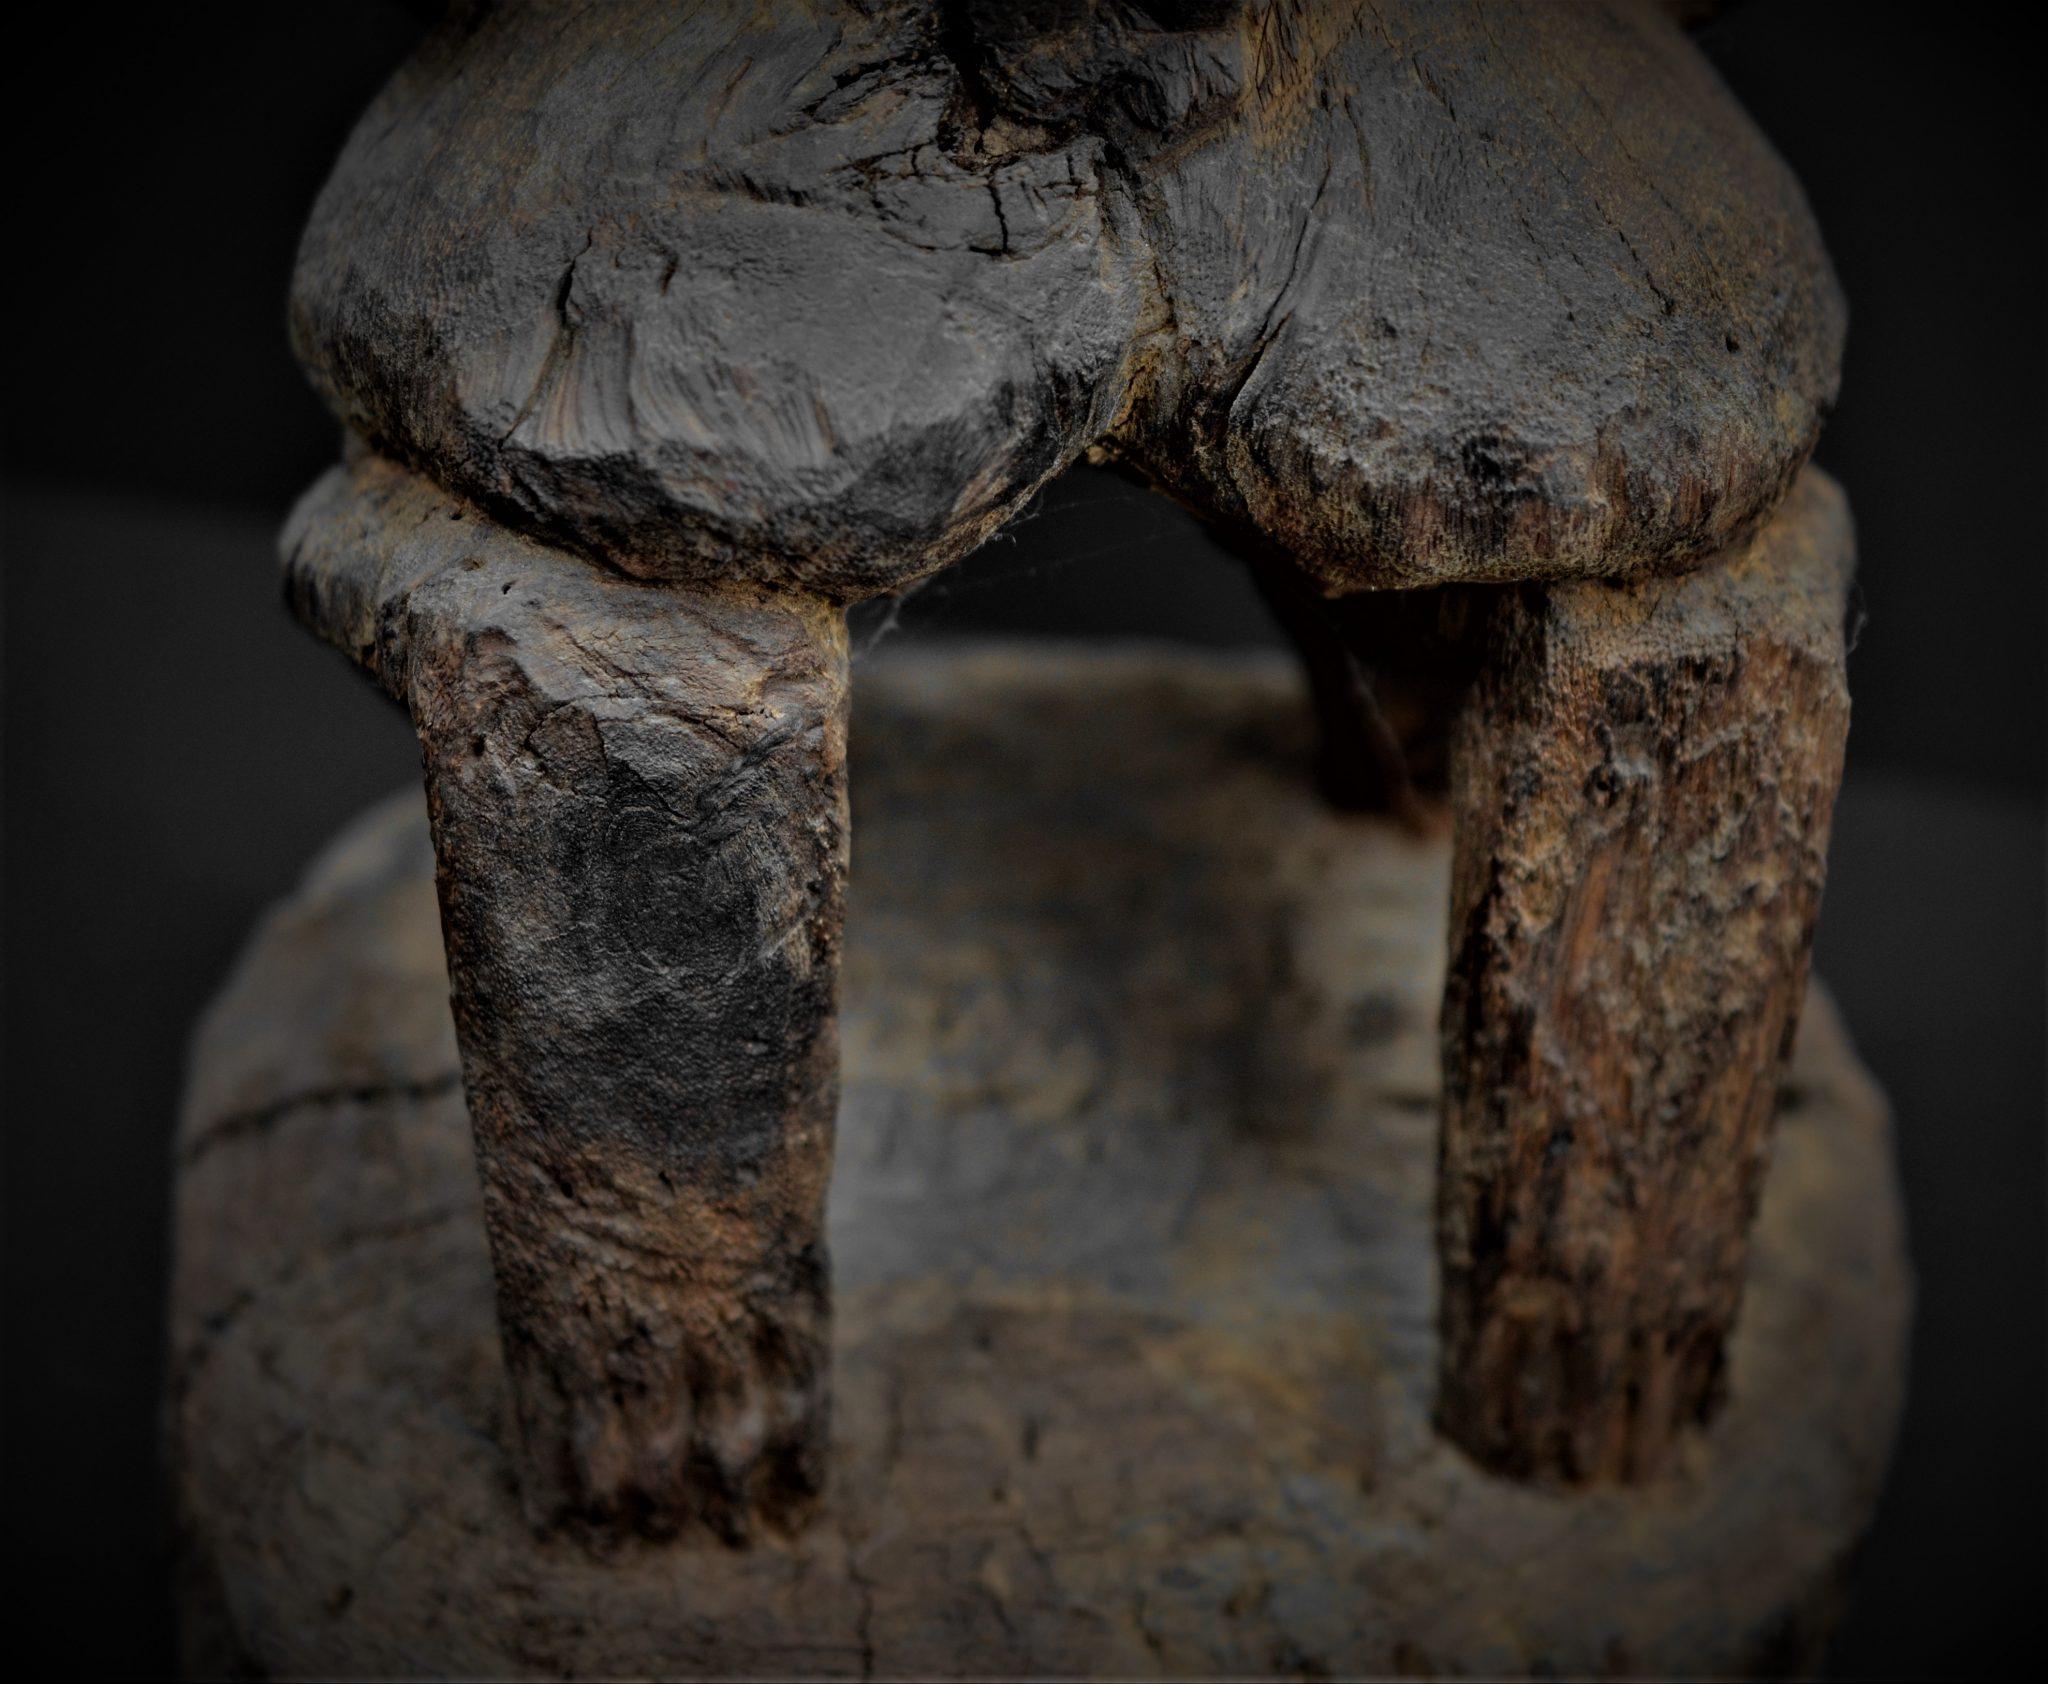 dogon statue detail pieds